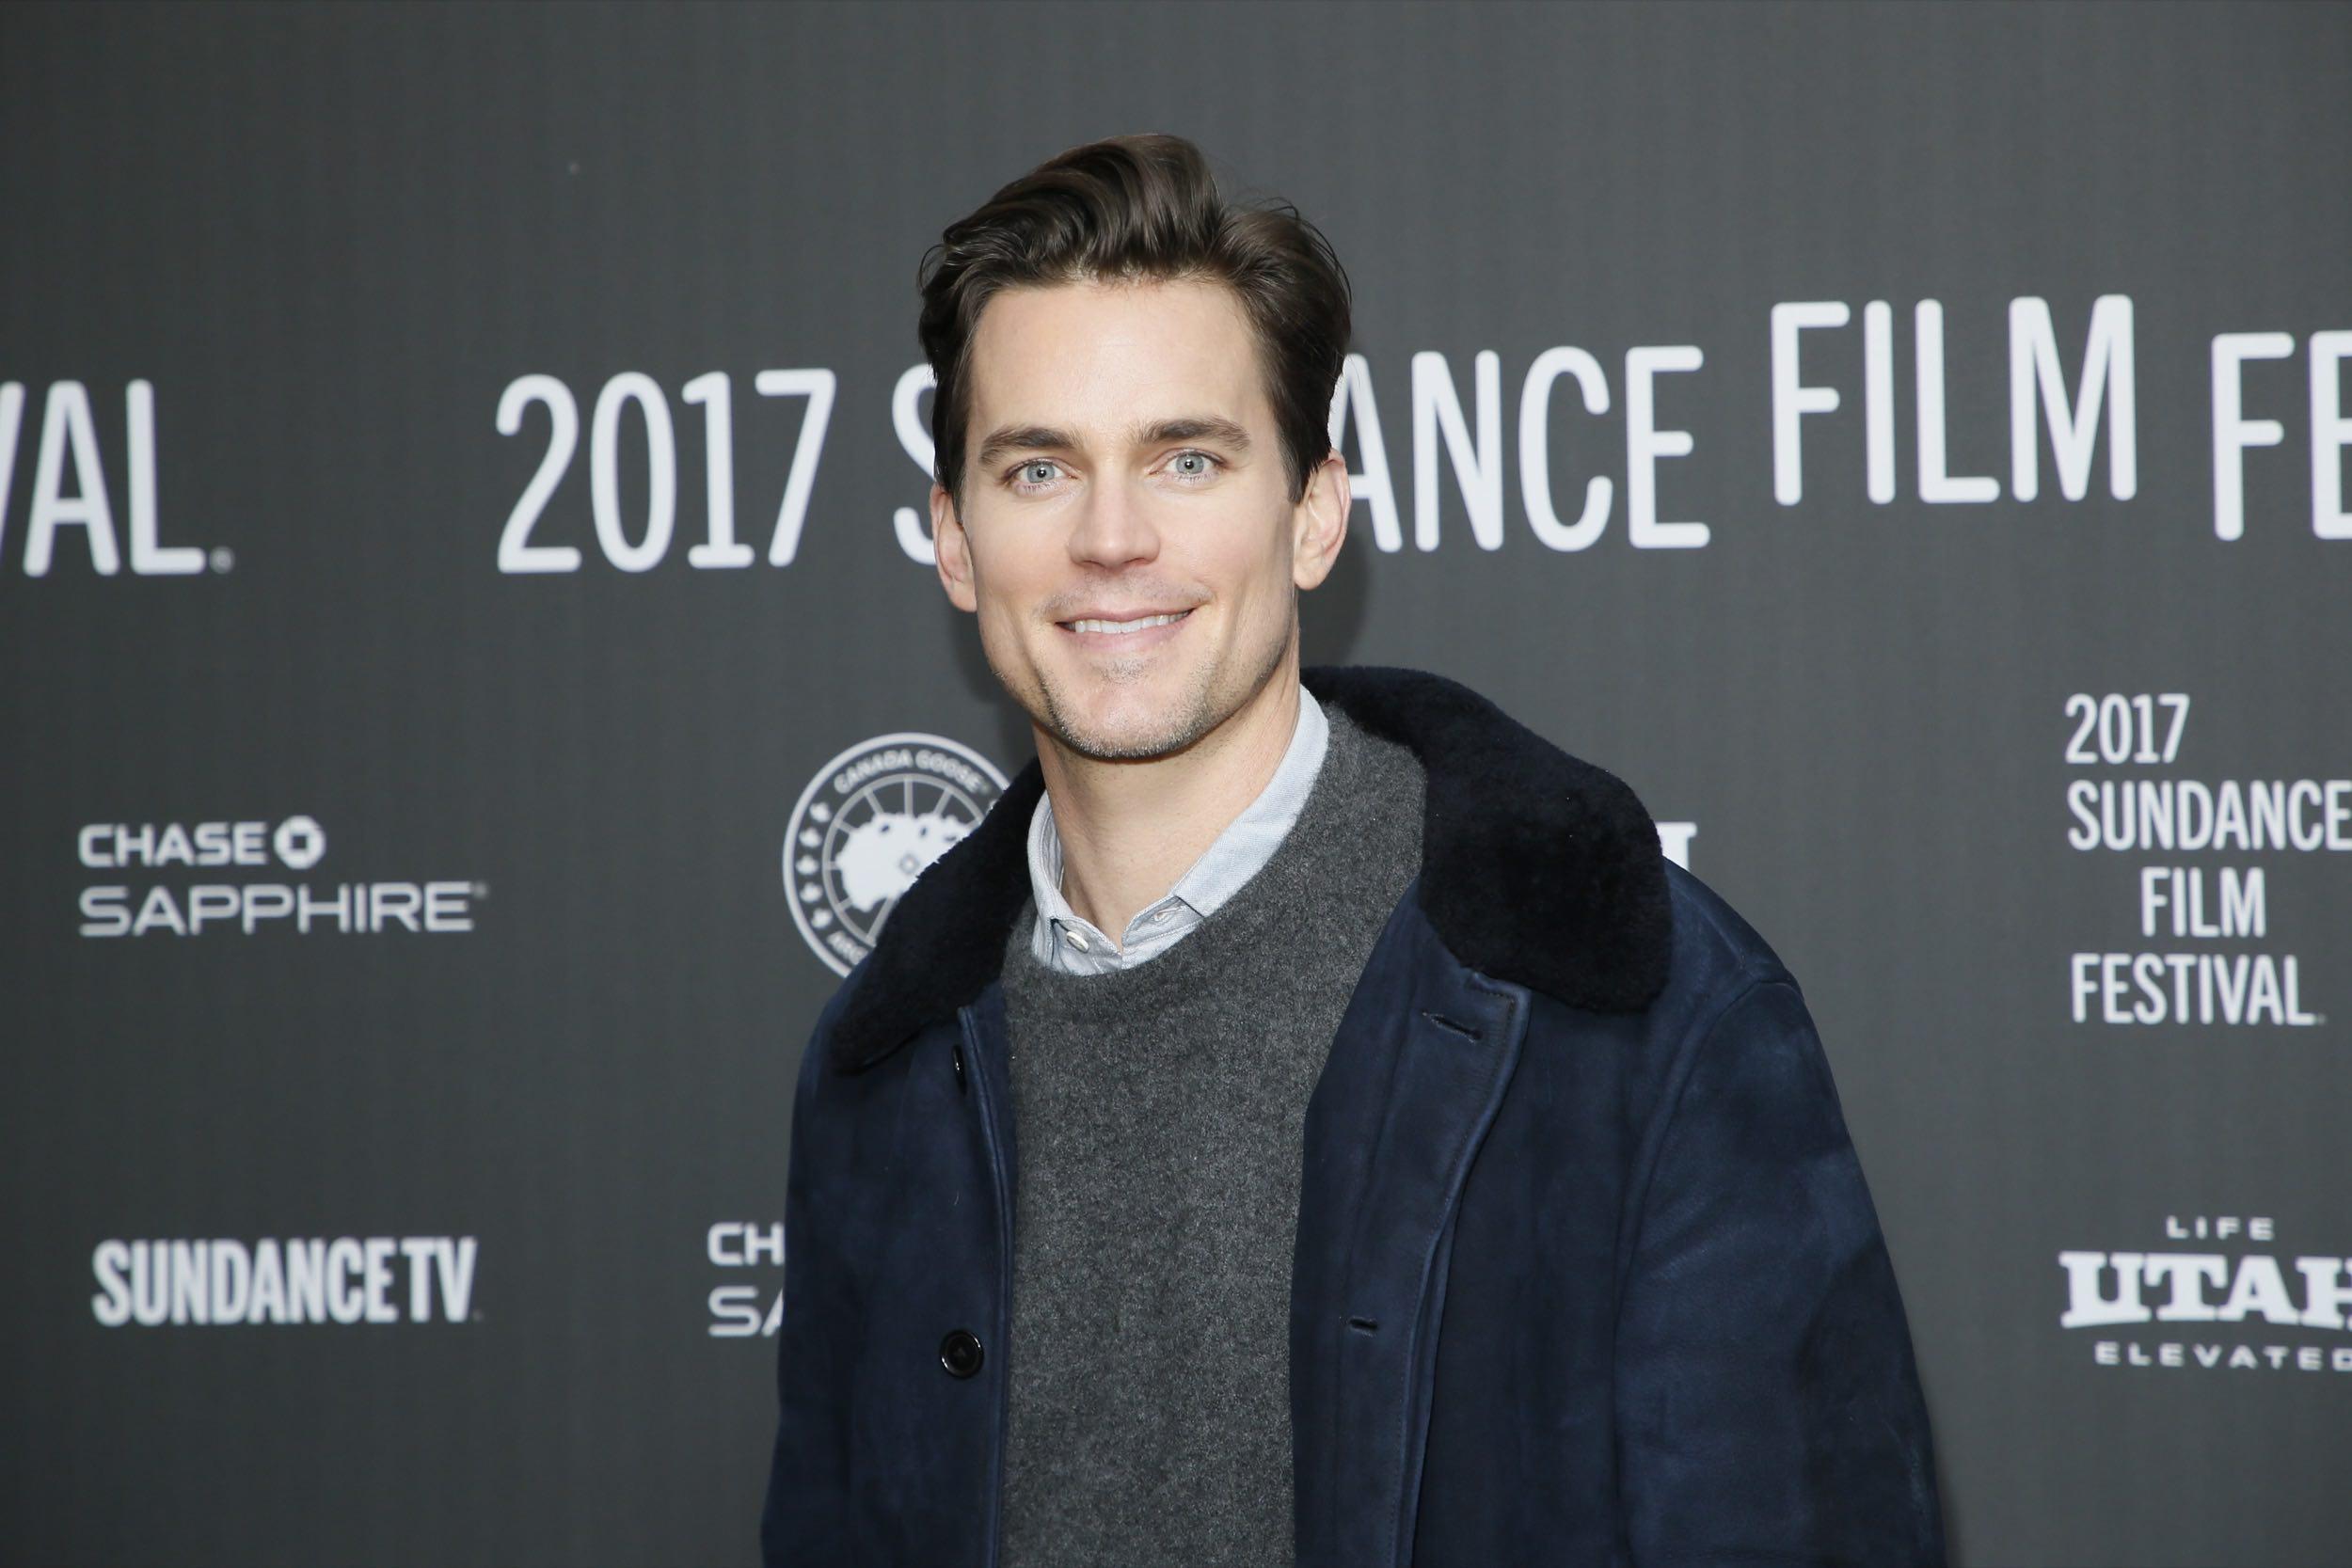 Matt Promotes 'Walking Out' On Sundance Festival